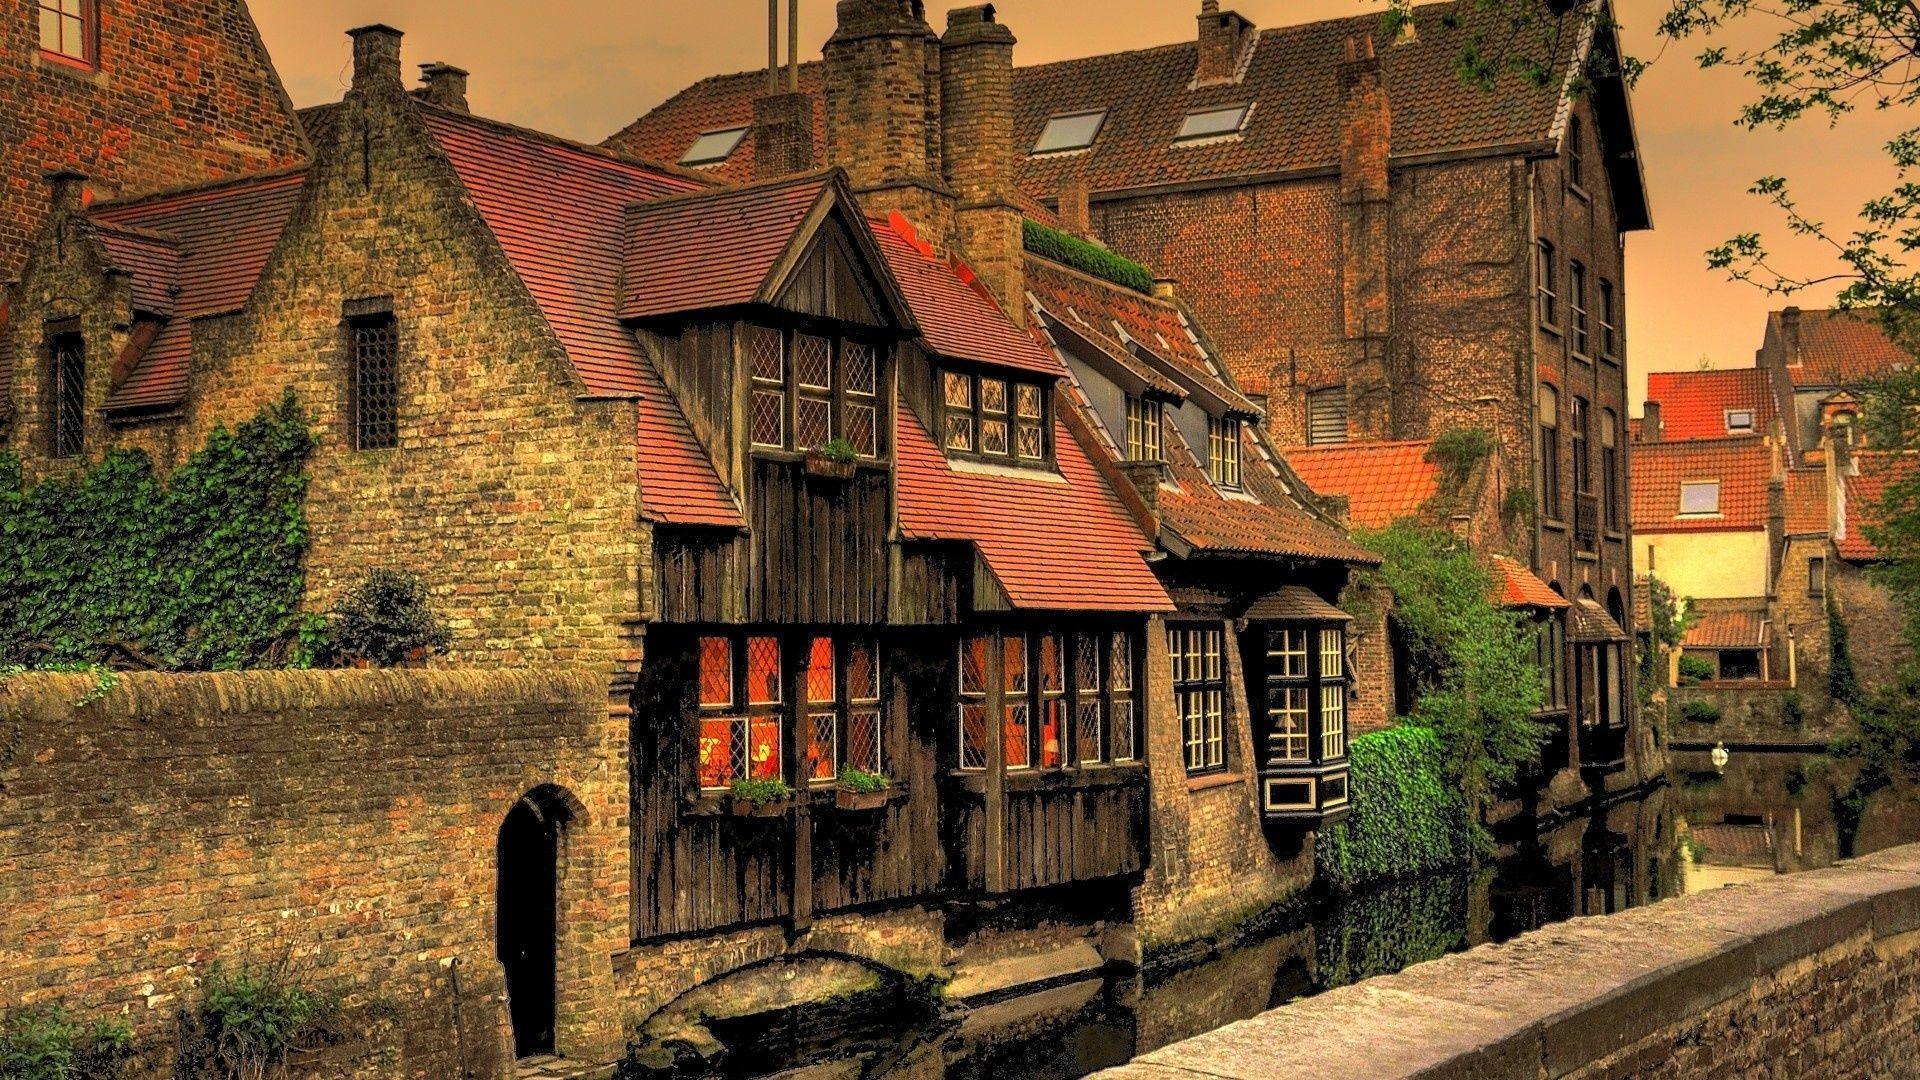 1920x1080 Brugge, Belgium, Houses, Watter City, Brugge, Canal ...